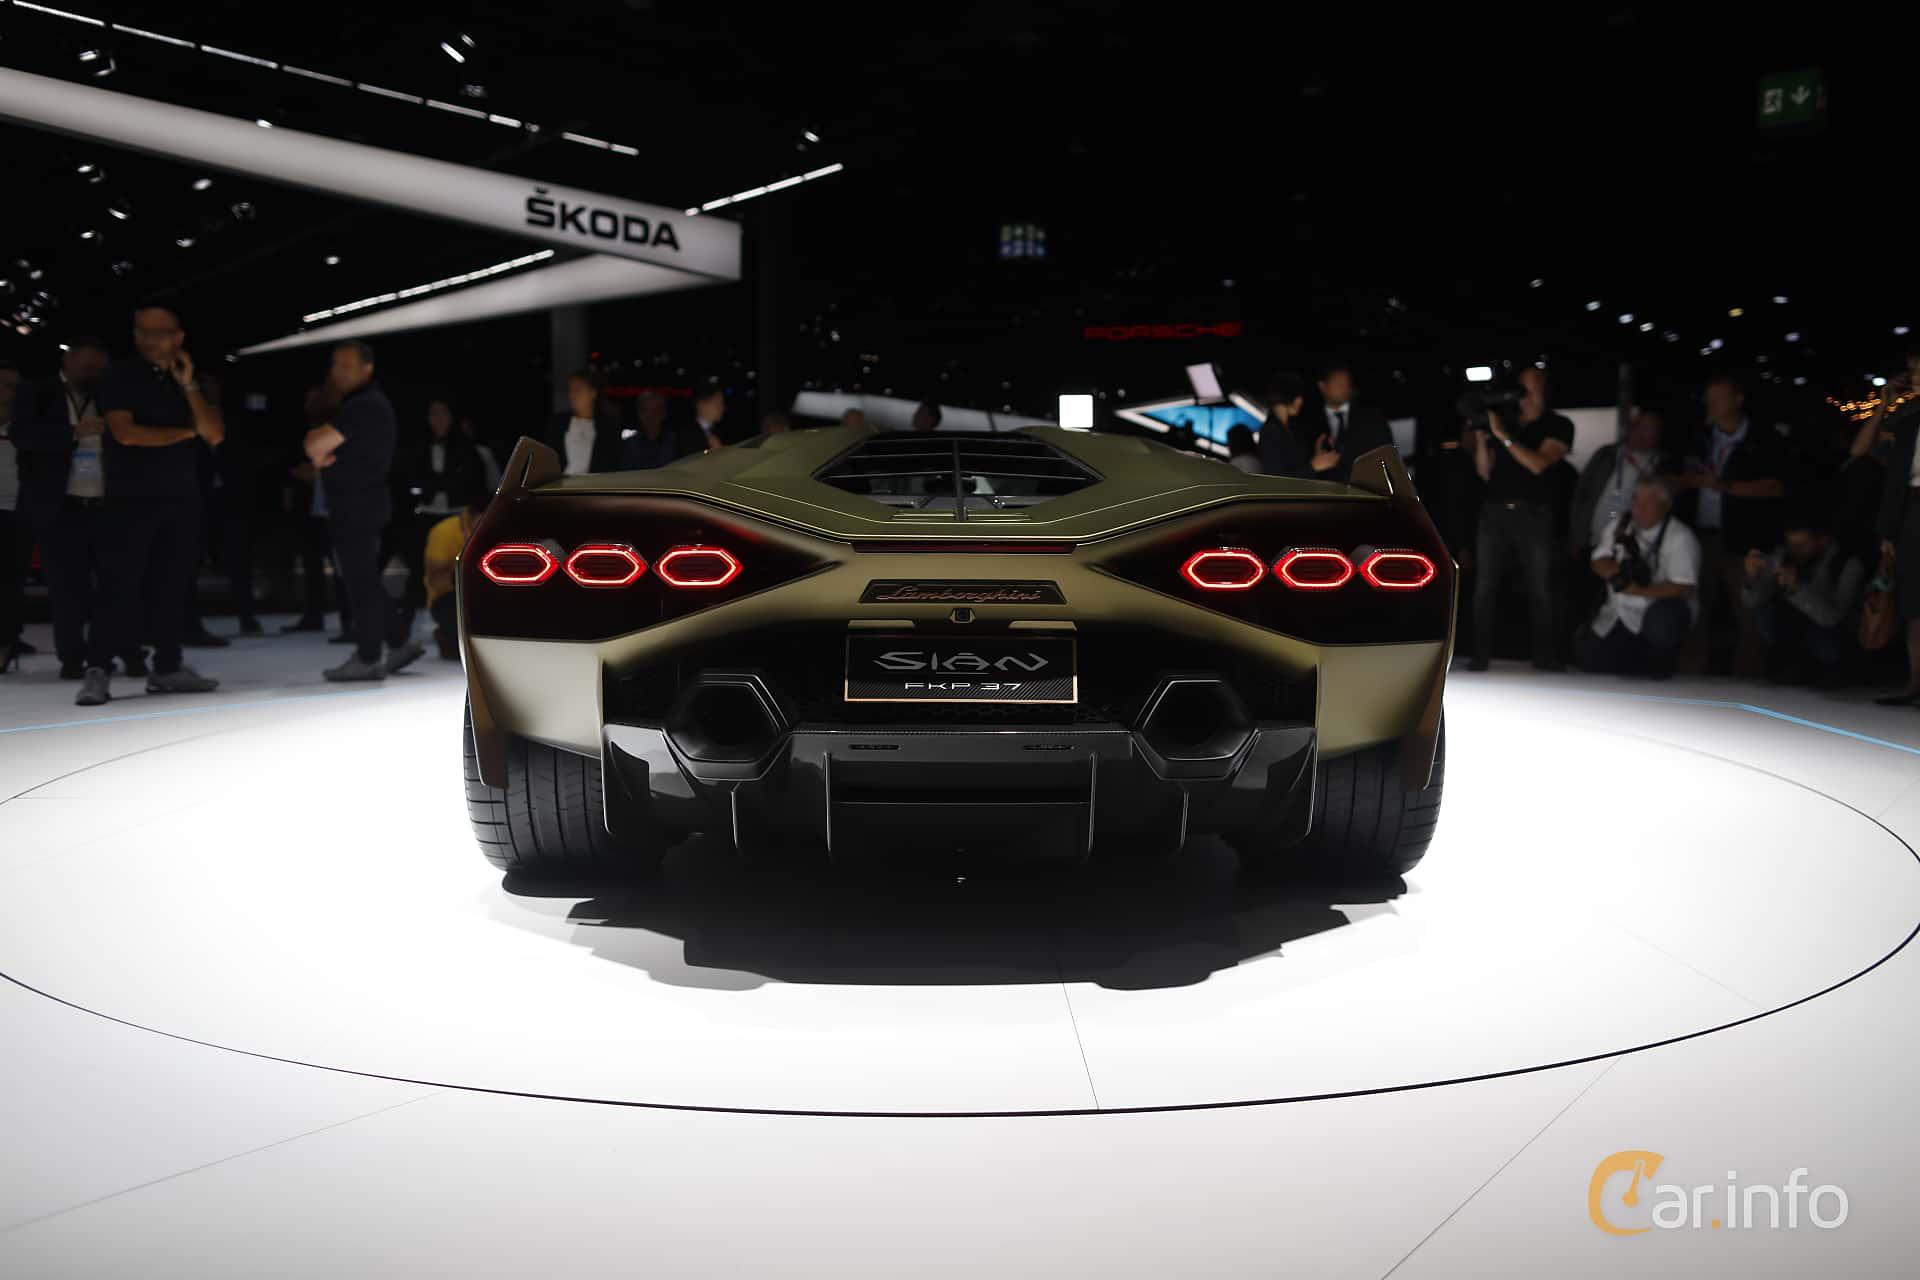 Lamborghini Sián 6.5 V12 ISR, 819hp, 2020 at IAA 2019